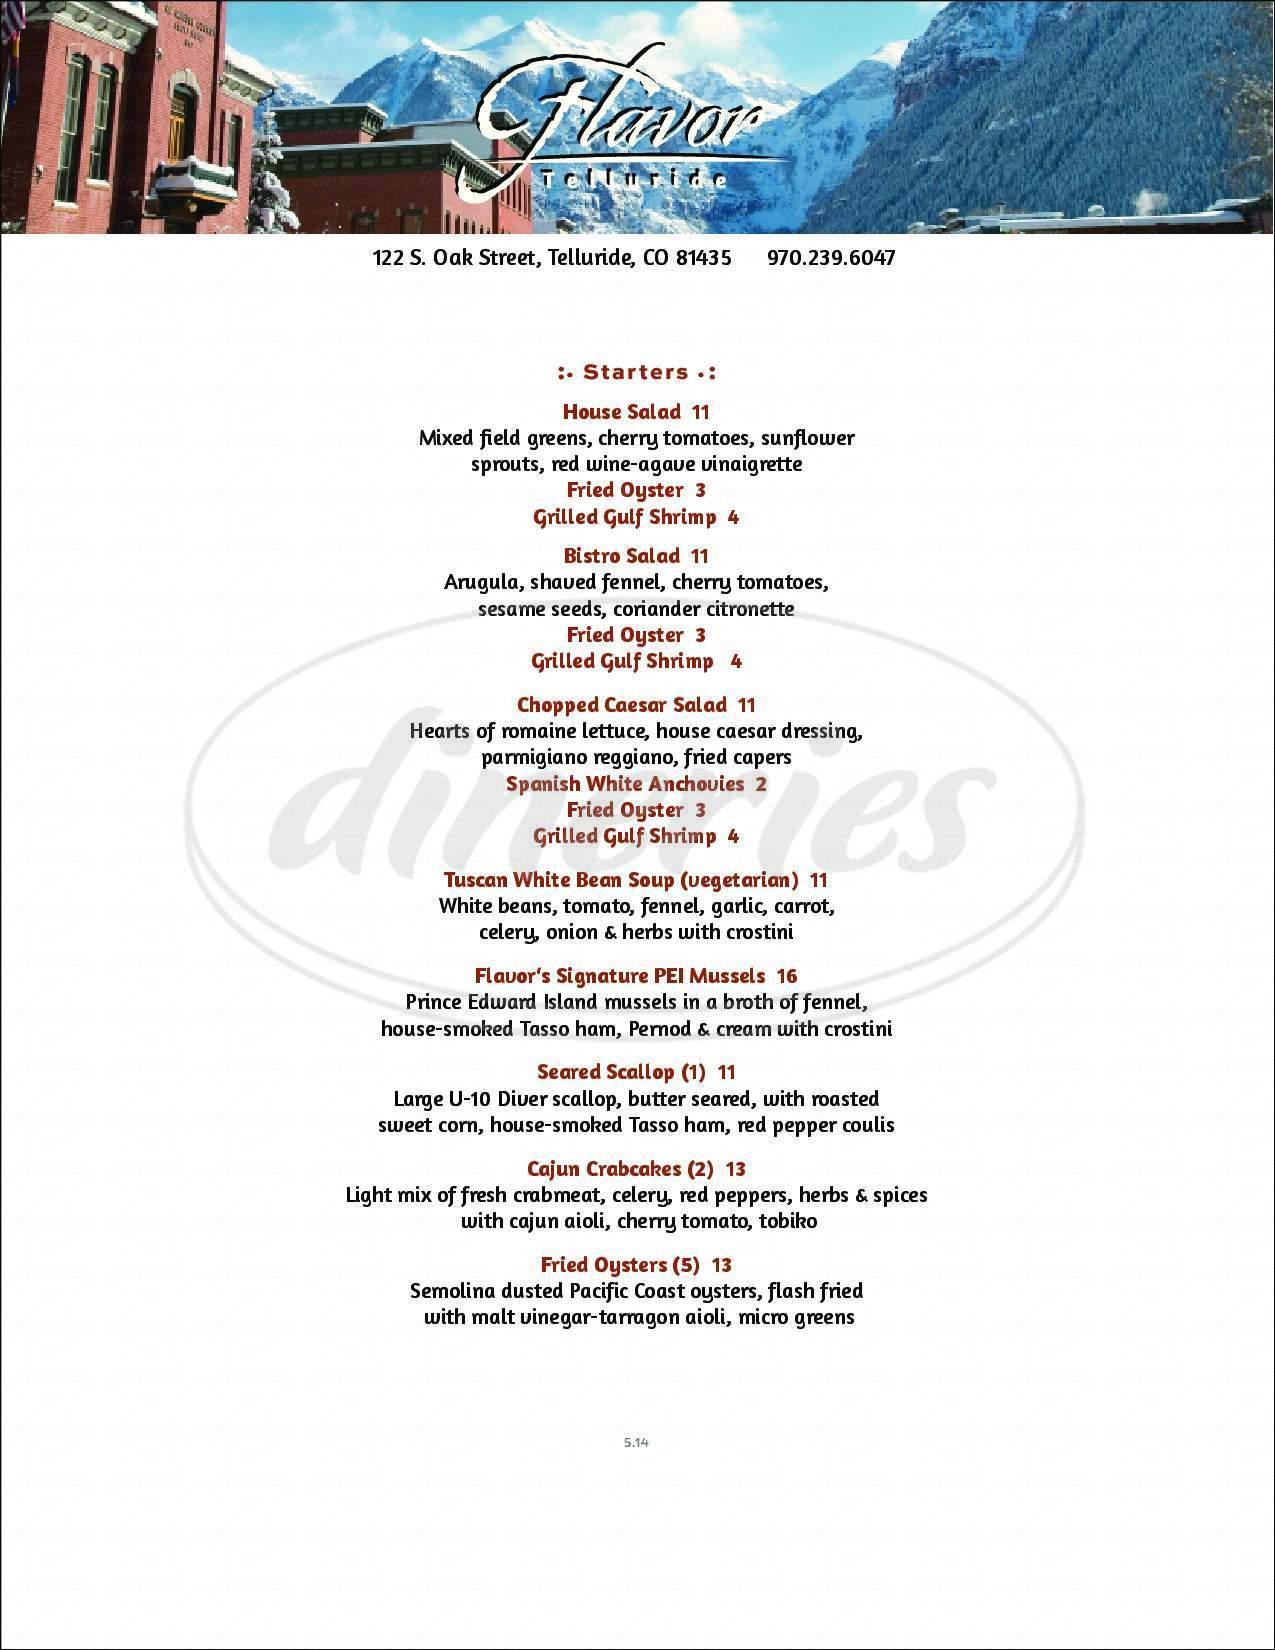 menu for Flavor Telluride